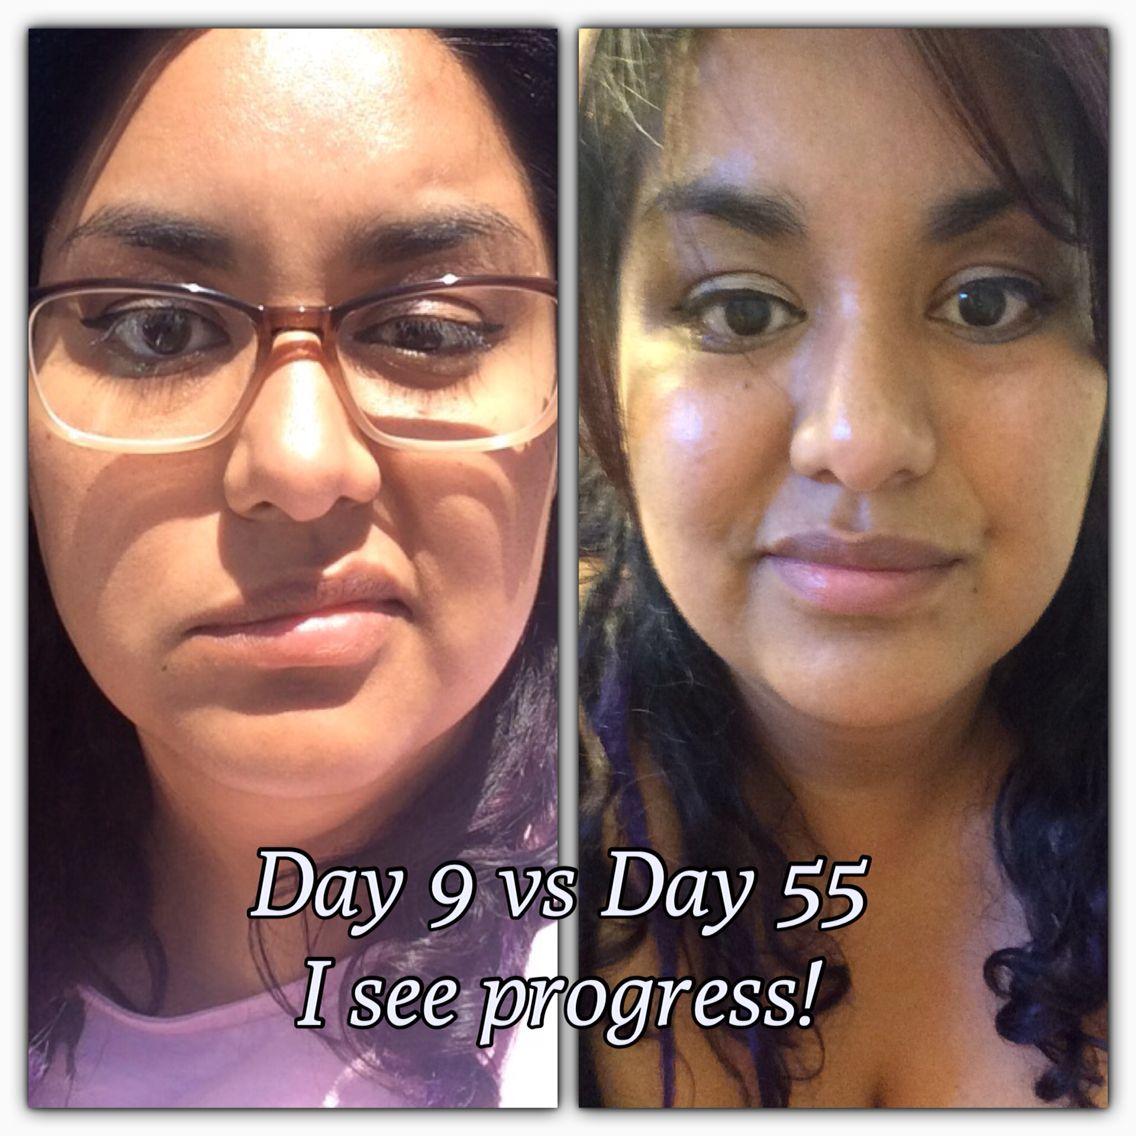 Progress Day 9 vs Day 55